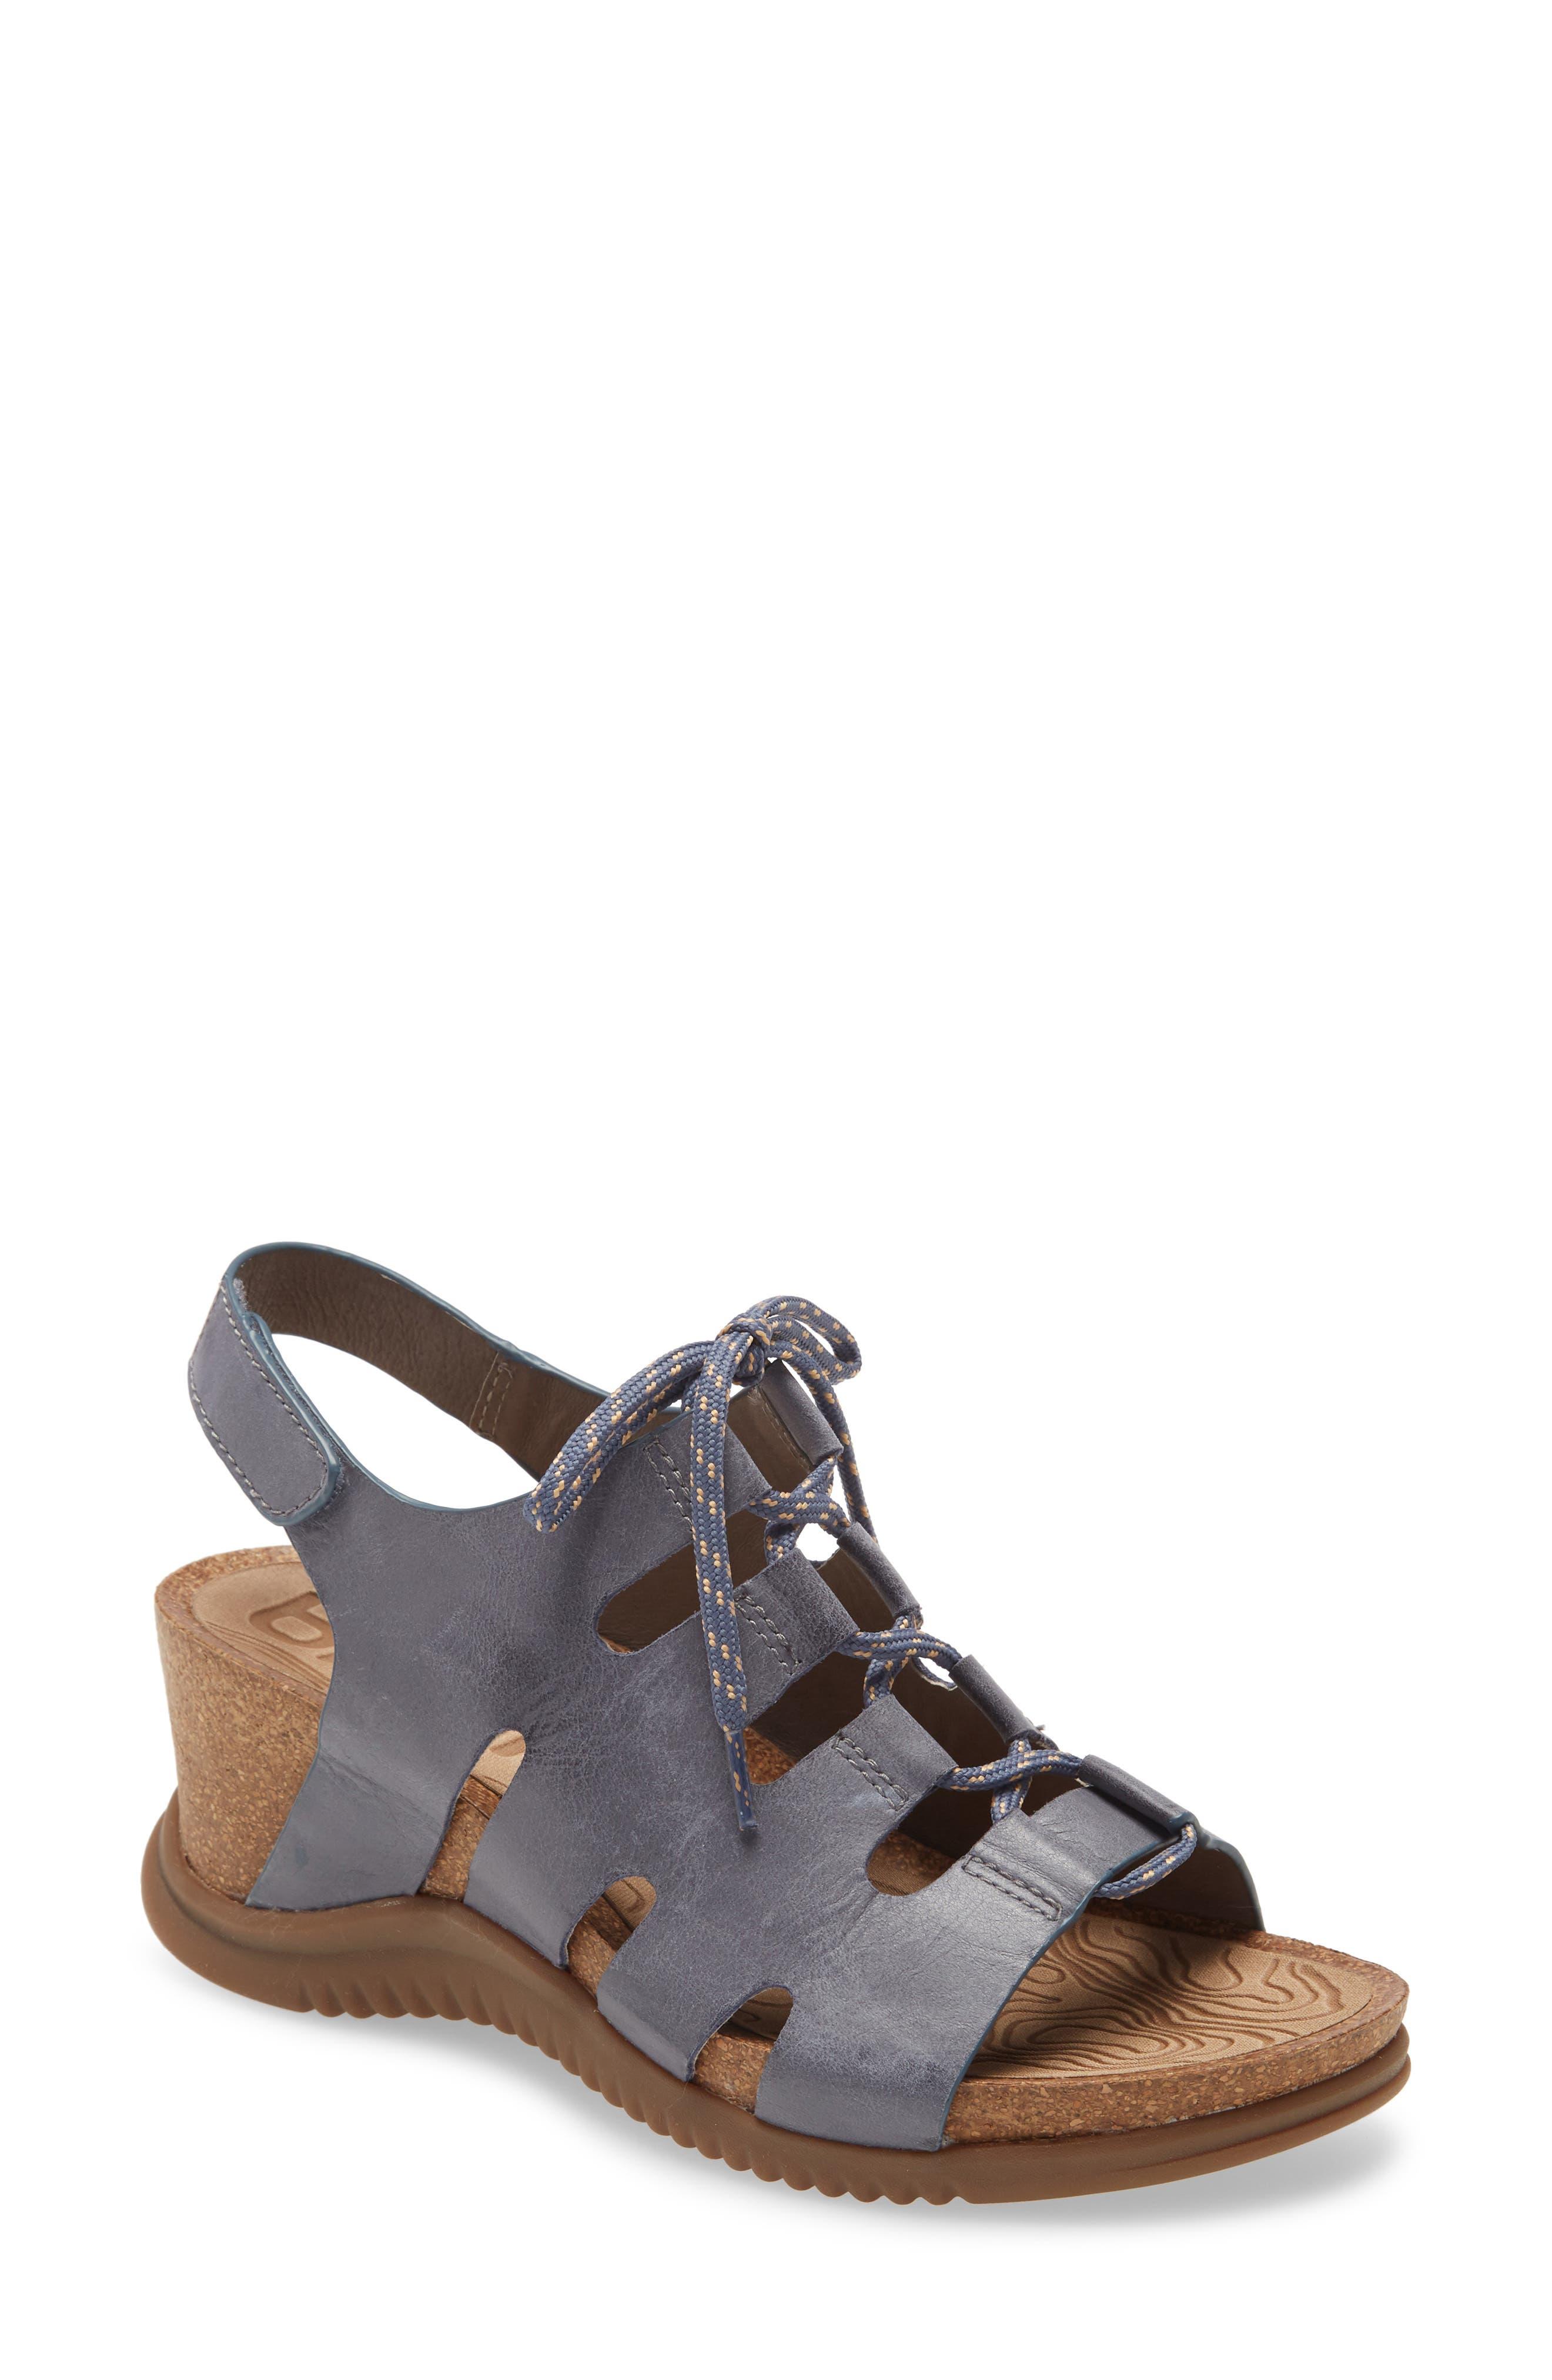 Women's Bionica Sorena Ghillie Wedge Sandal, Size 11 M - Blue